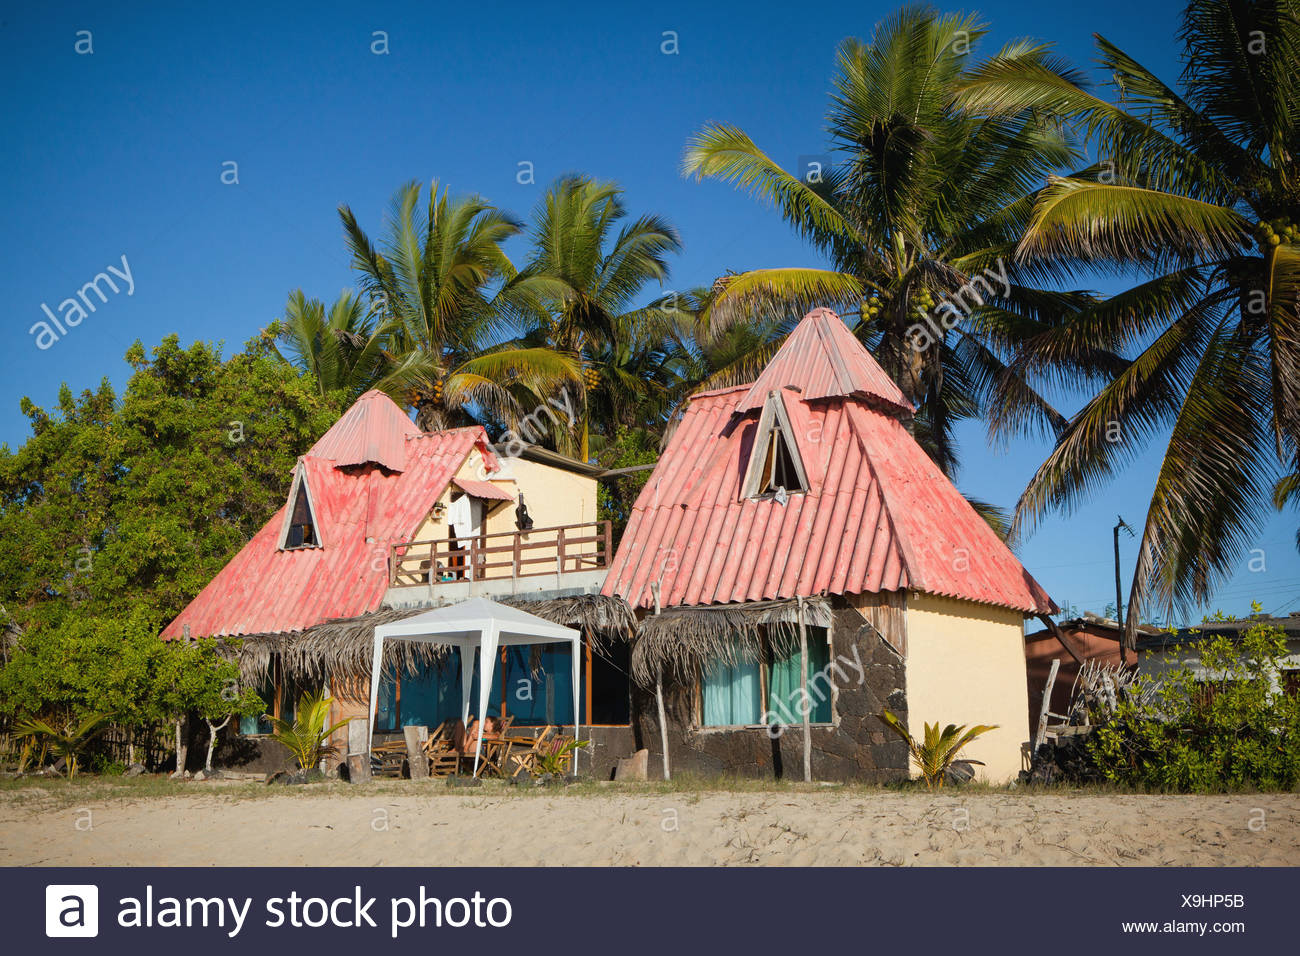 Beach House Galapagos Islands Stock Photo 281288375 Alamy